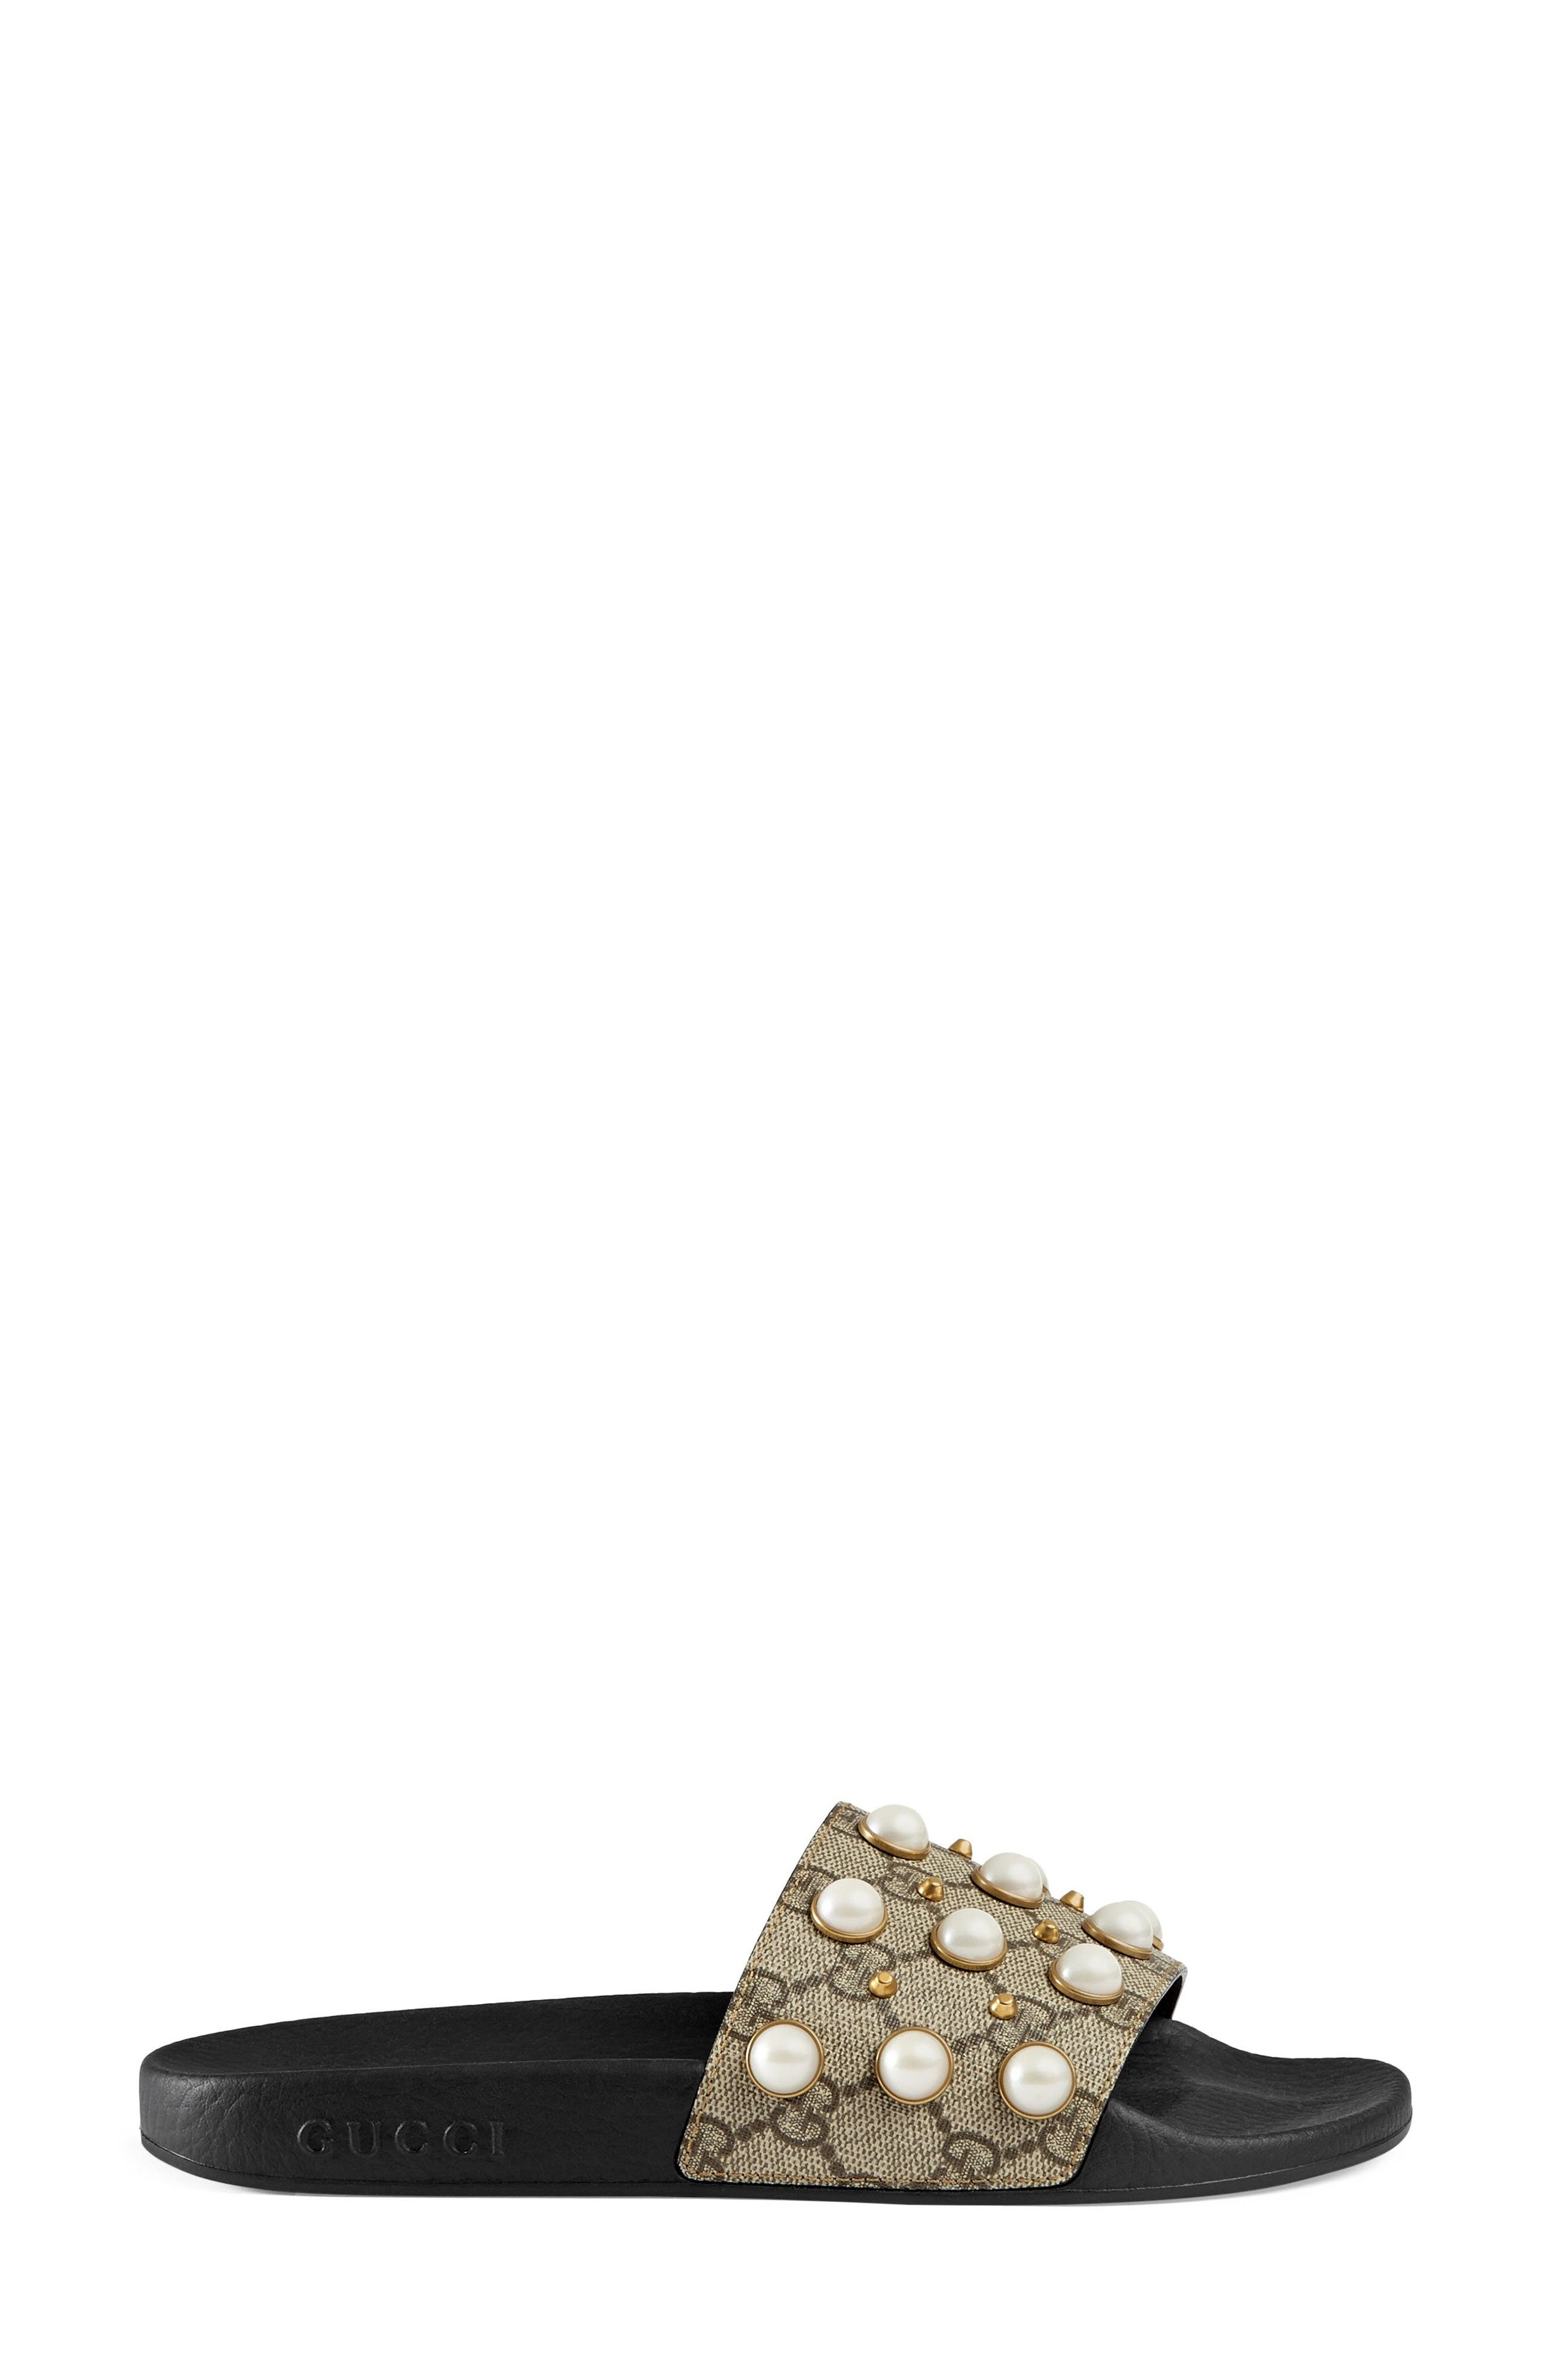 Main Image - Gucci Pursuit Imitation Pearl Embellished Slide Sandal (Women)